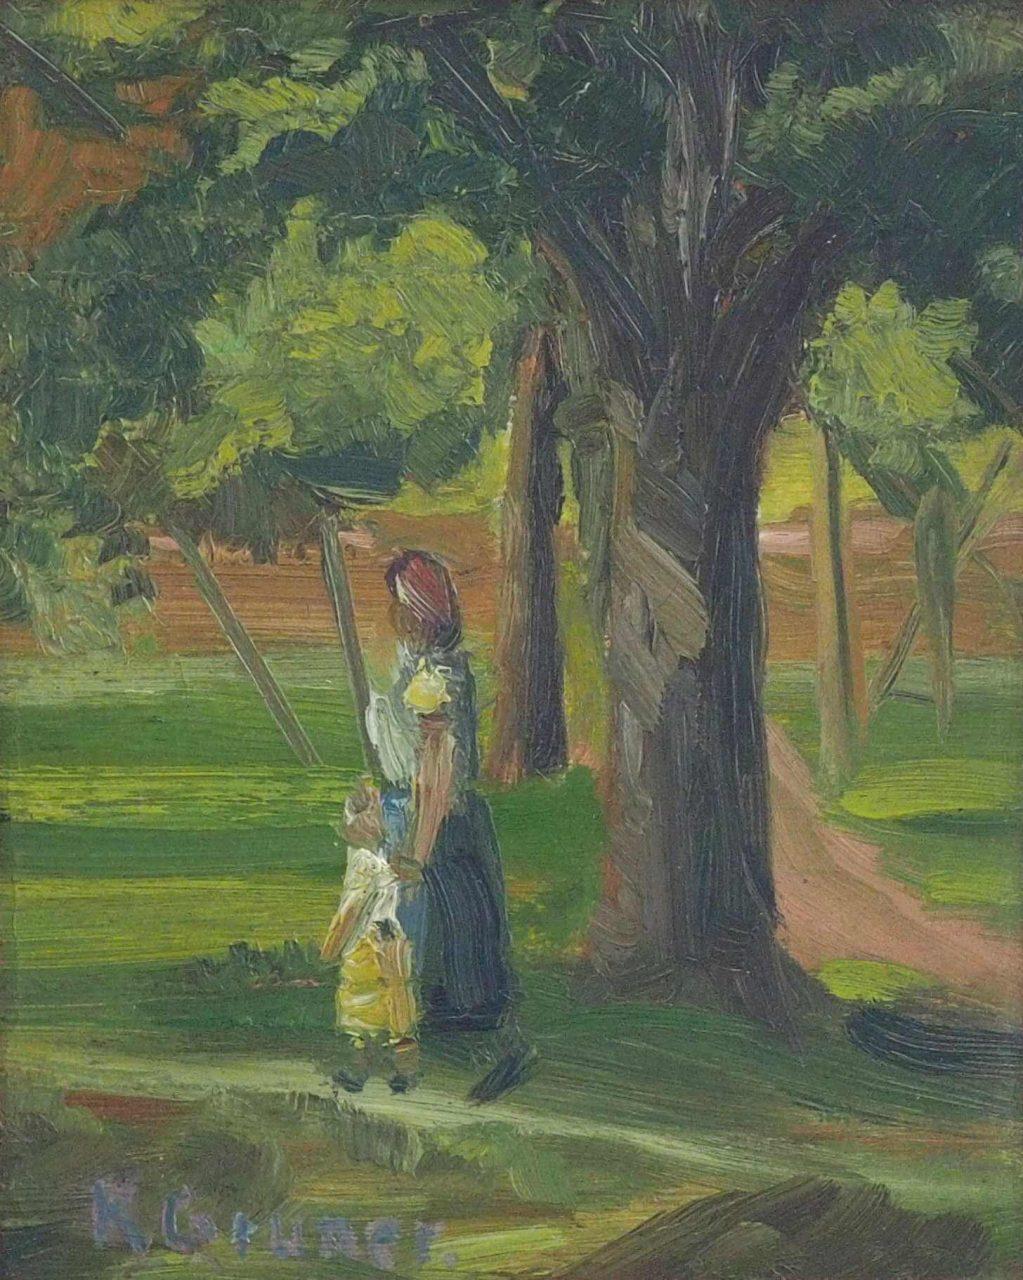 K. Gruner - Spaziergang im Park